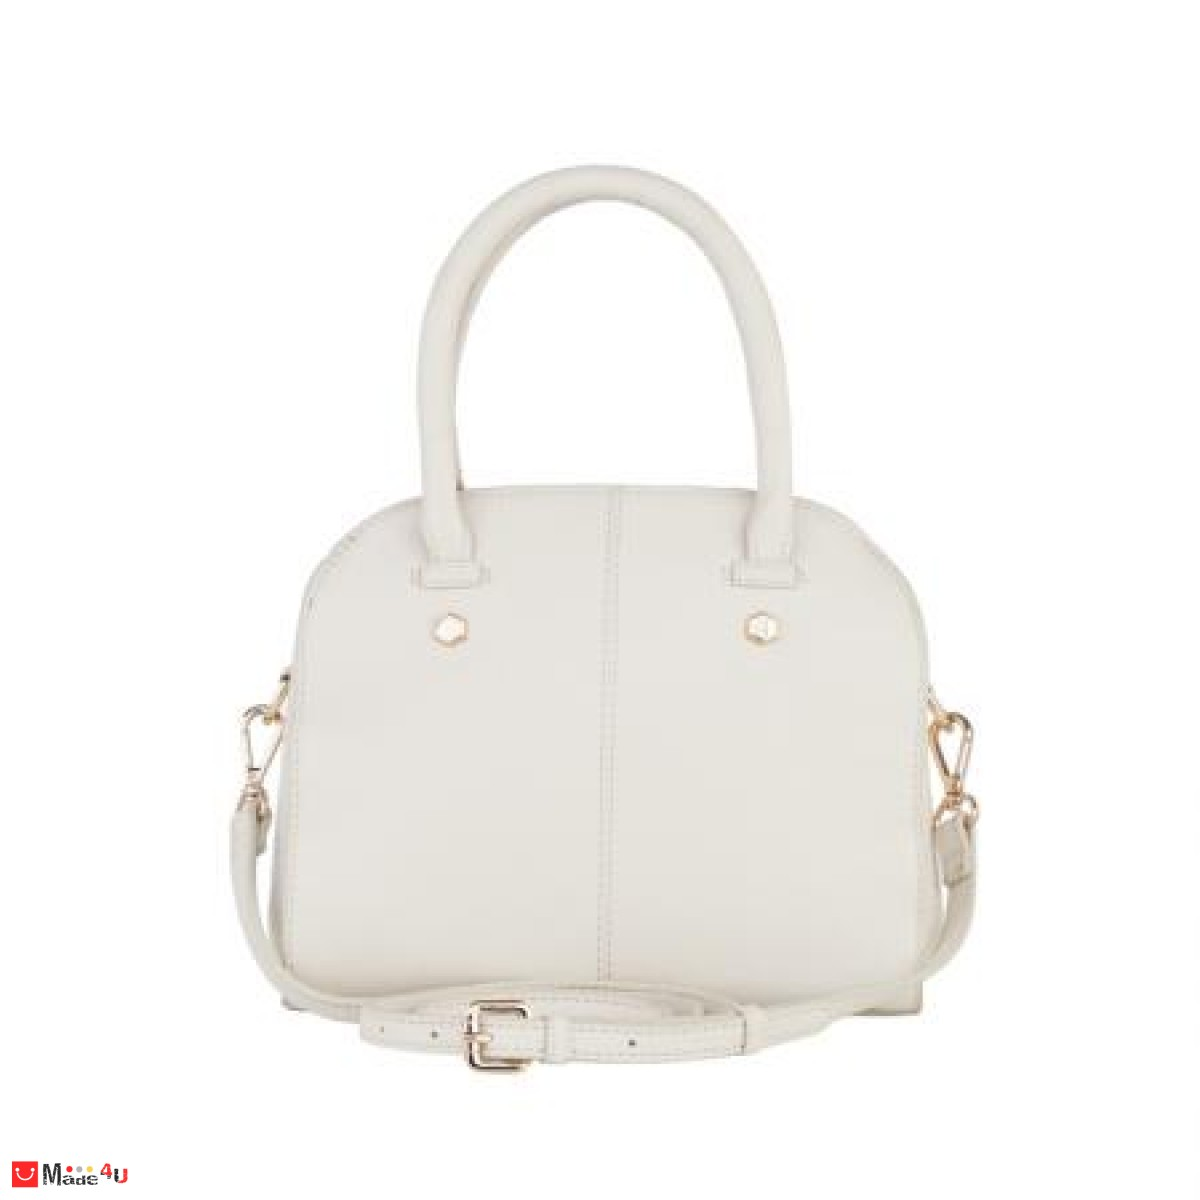 Дамска чанта естествена кожа 21х25см, слонова кост